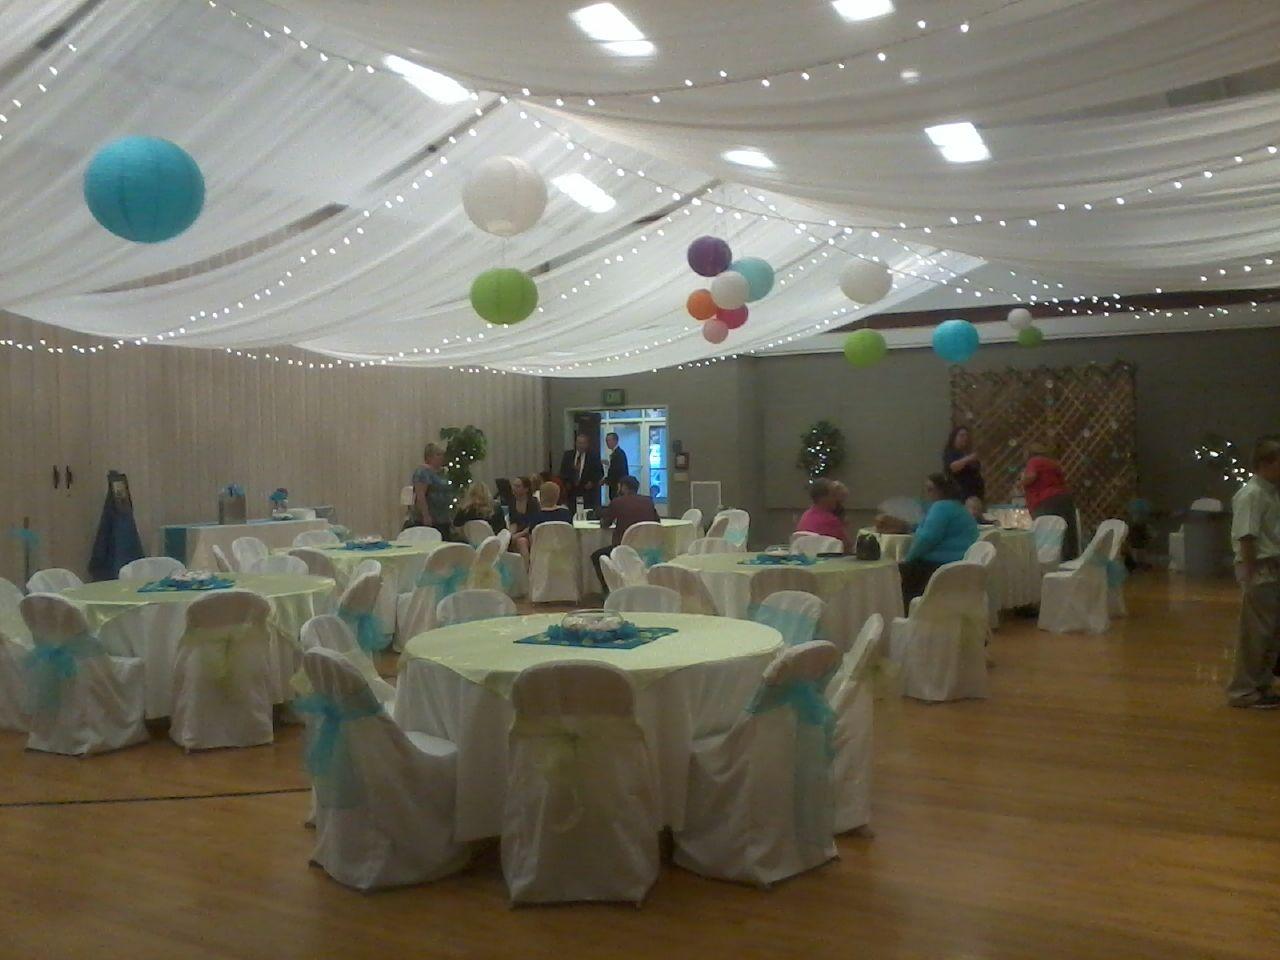 Ceiling Wedding Decorations Decorating Lds Gym For Wedding Google Search Wedding Decor